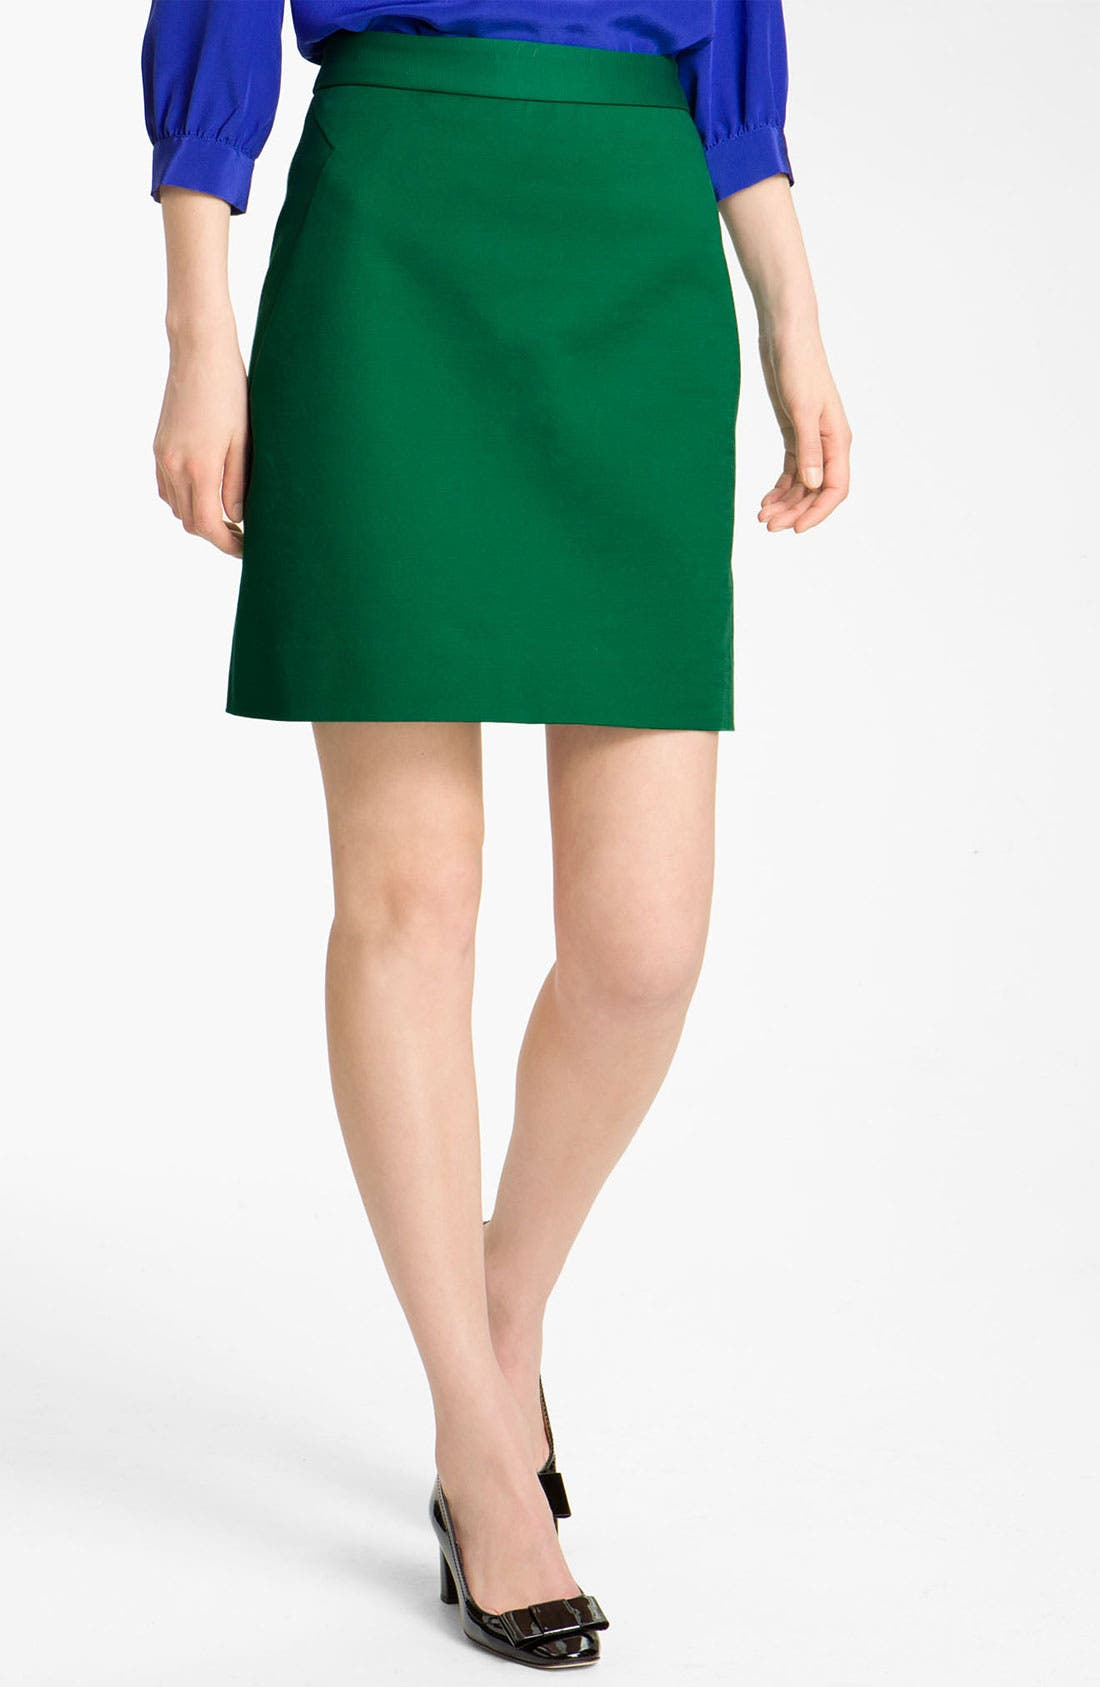 Alternate Image 1 Selected - kate spade new york 'valentine' skirt